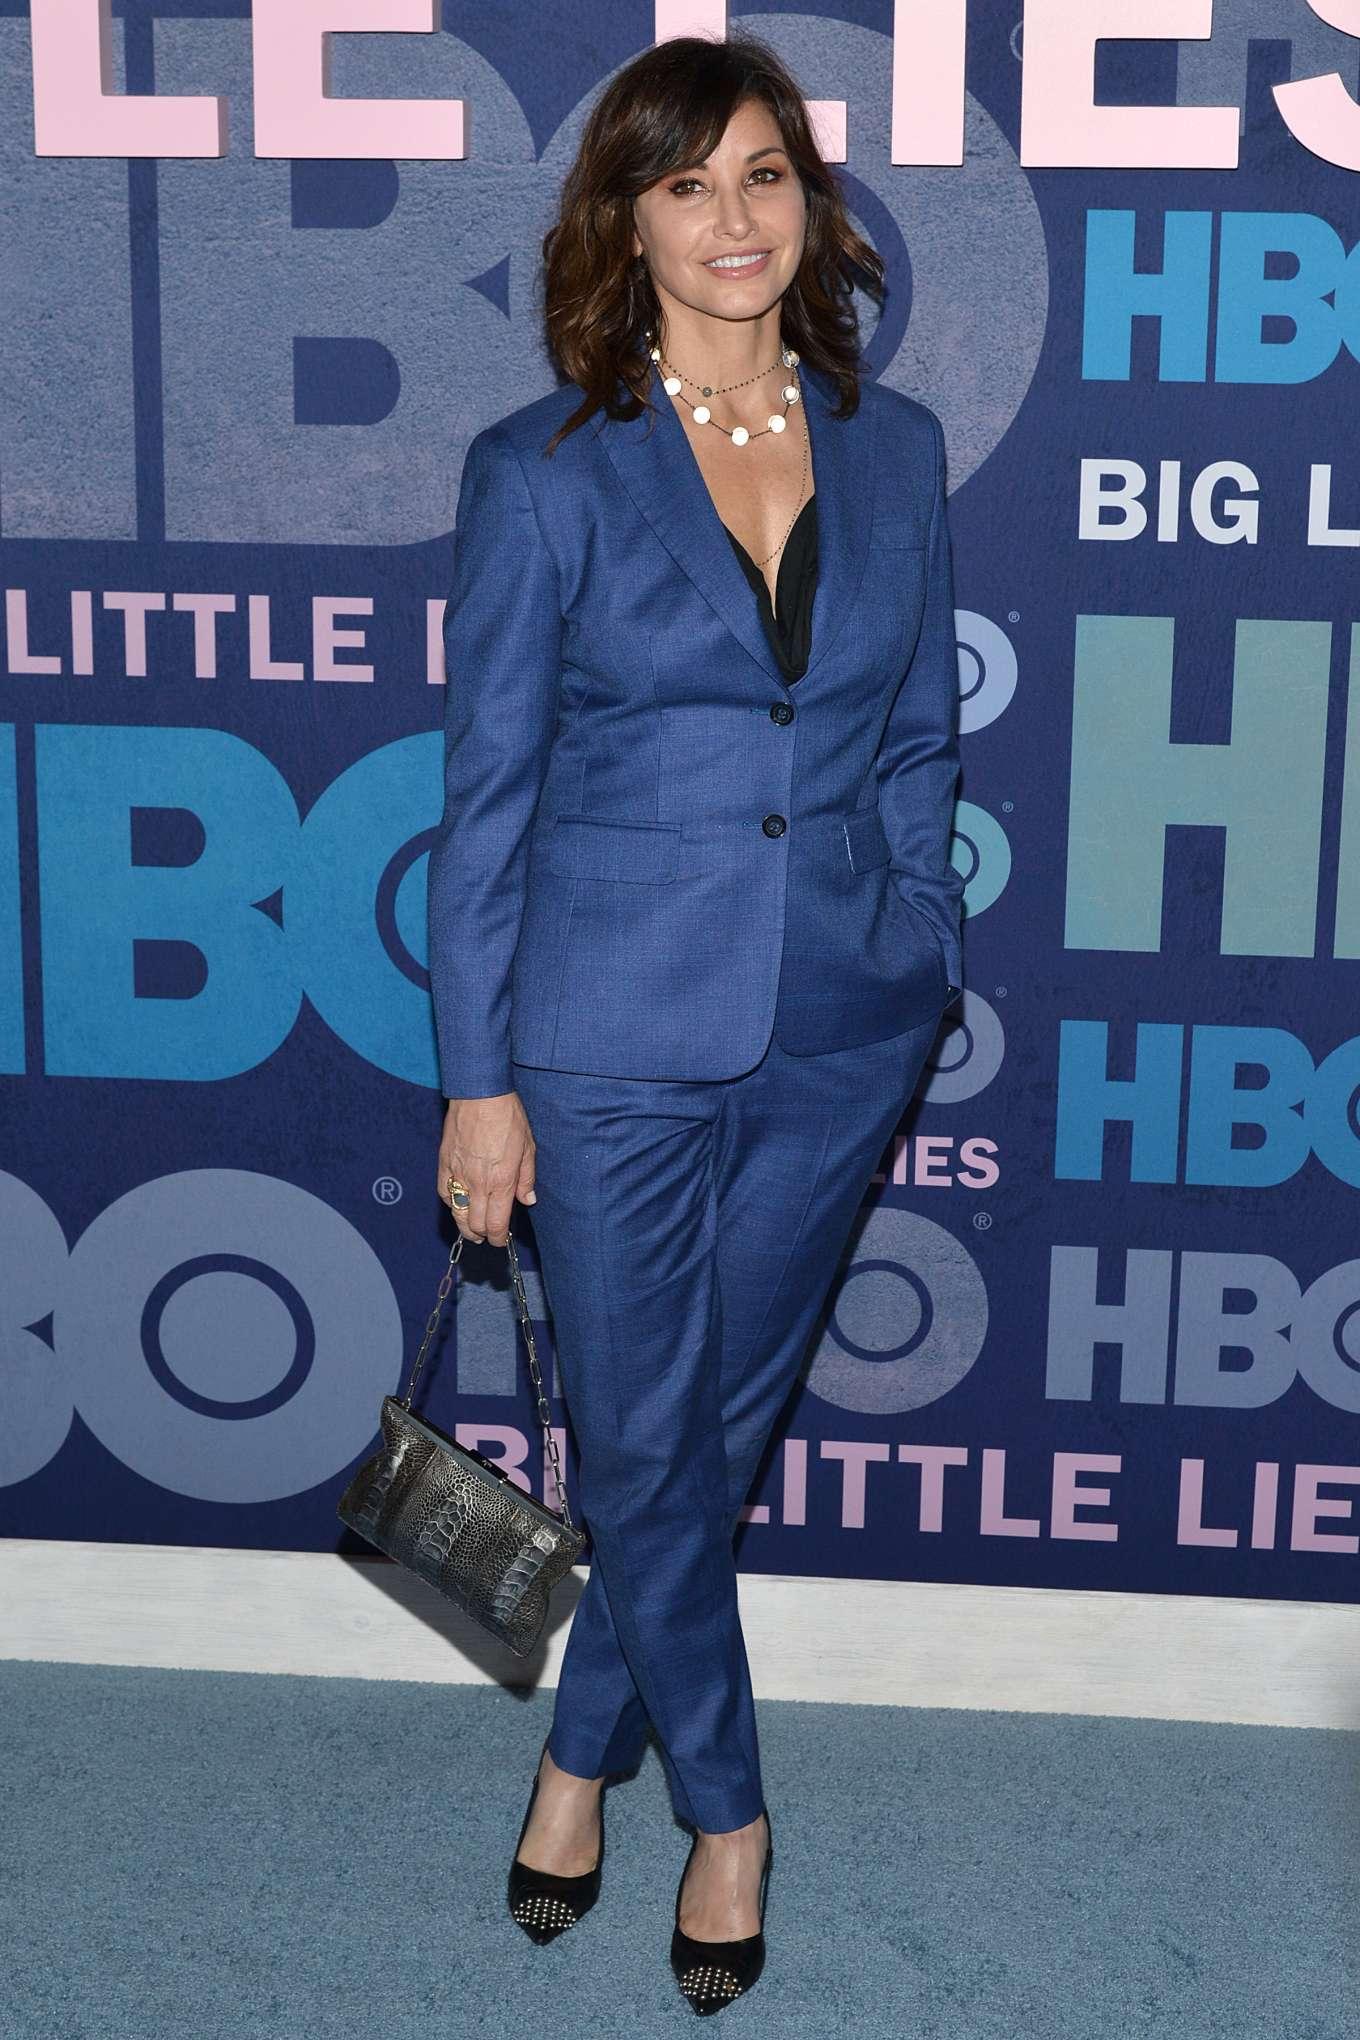 Gina Gershon 2019 : Gina Gershon: Big Little Lies Season 2 Premiere-08